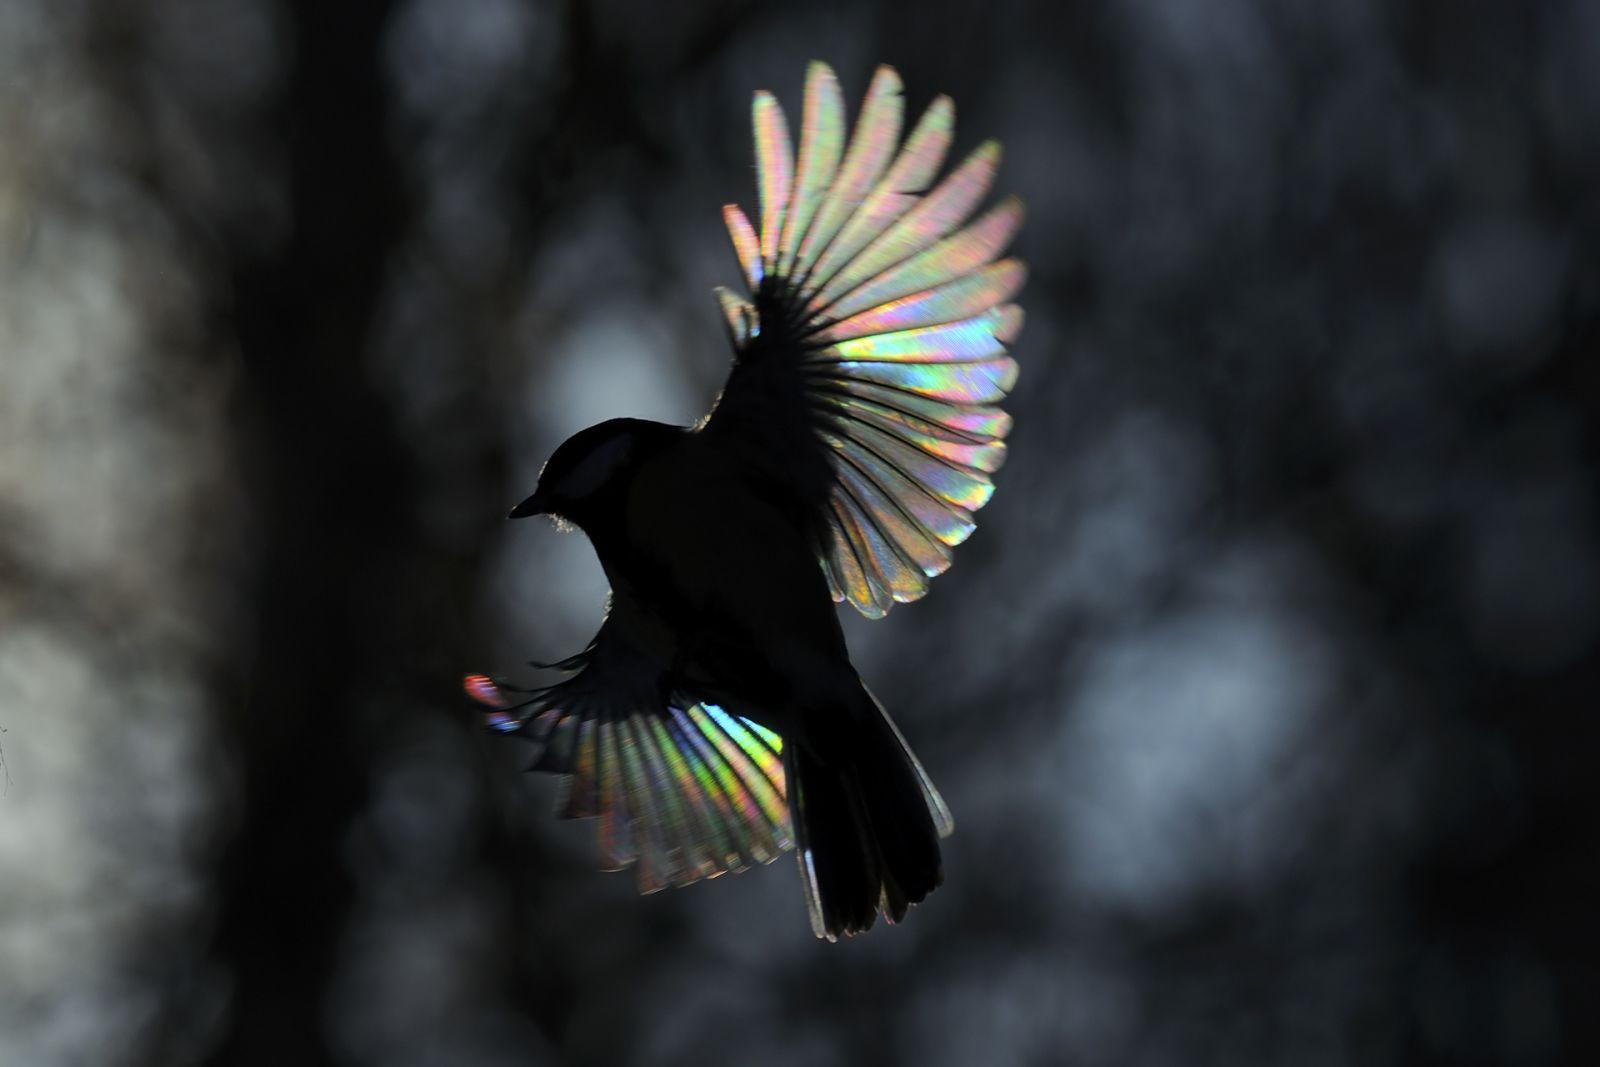 Жар-птичка, © Виктор Тяхт, Финалист фотоконкурса «Самая красивая страна – 2018»